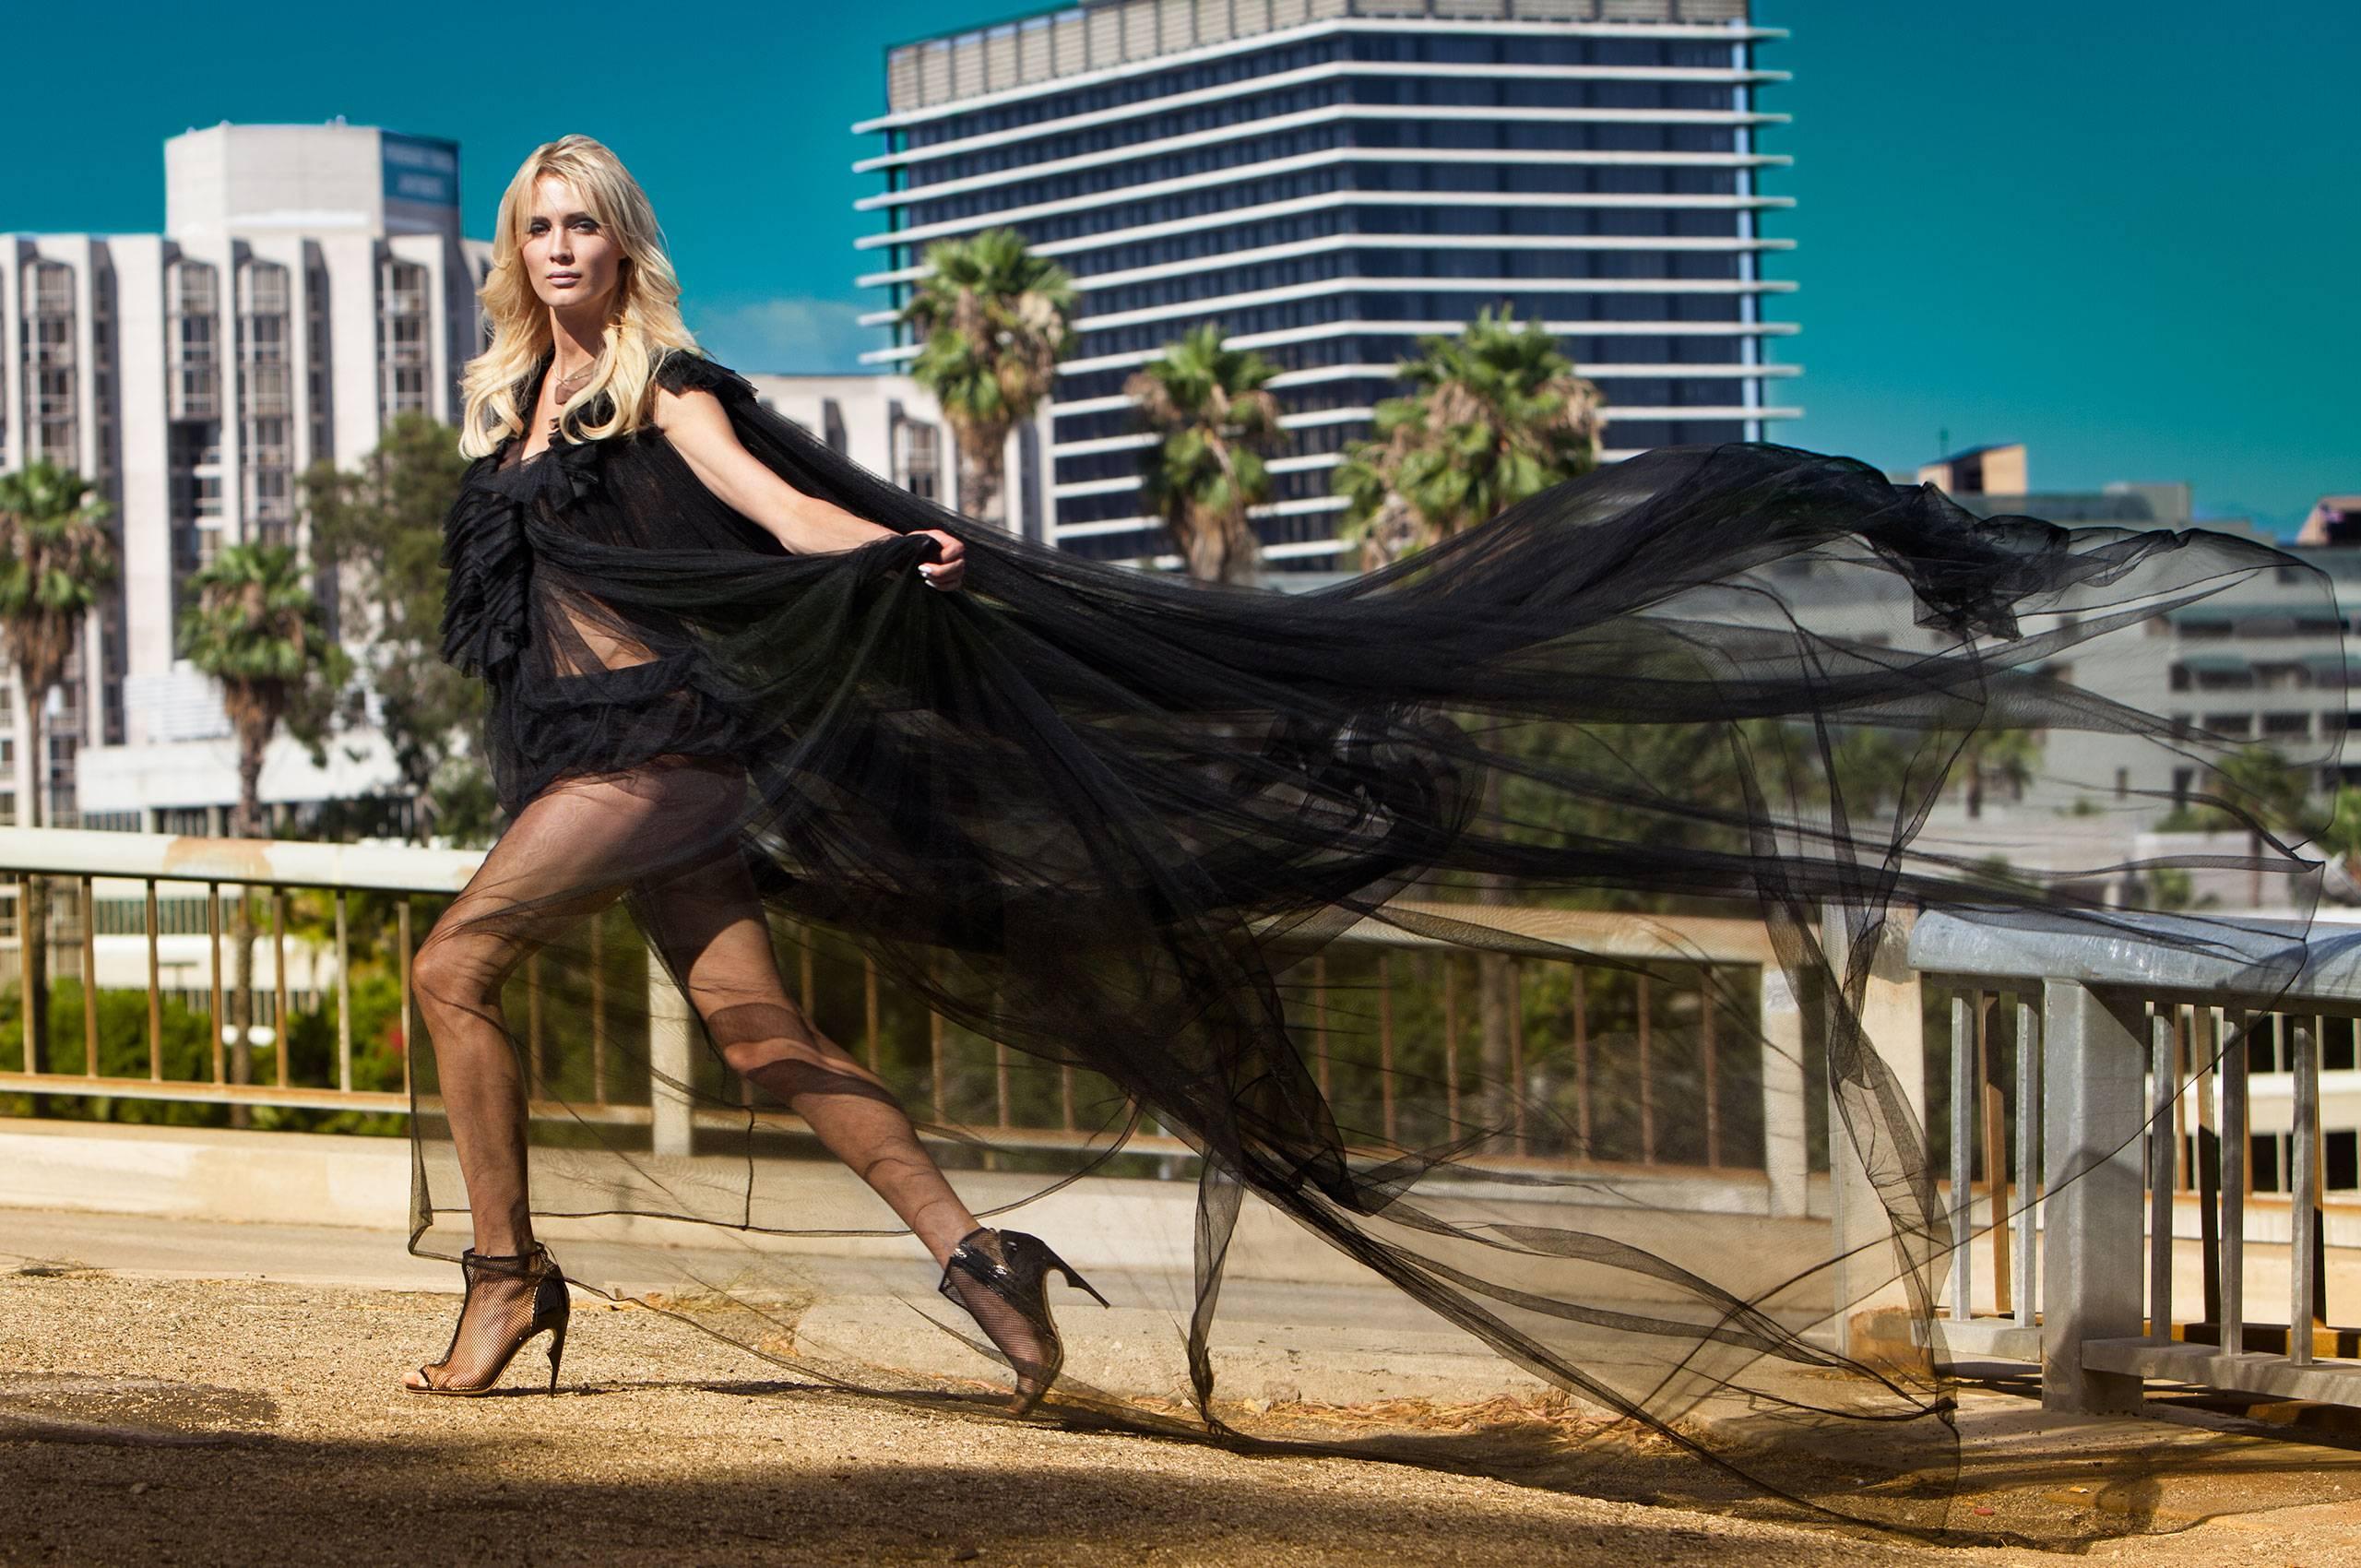 sheer_black_dress1.jpg